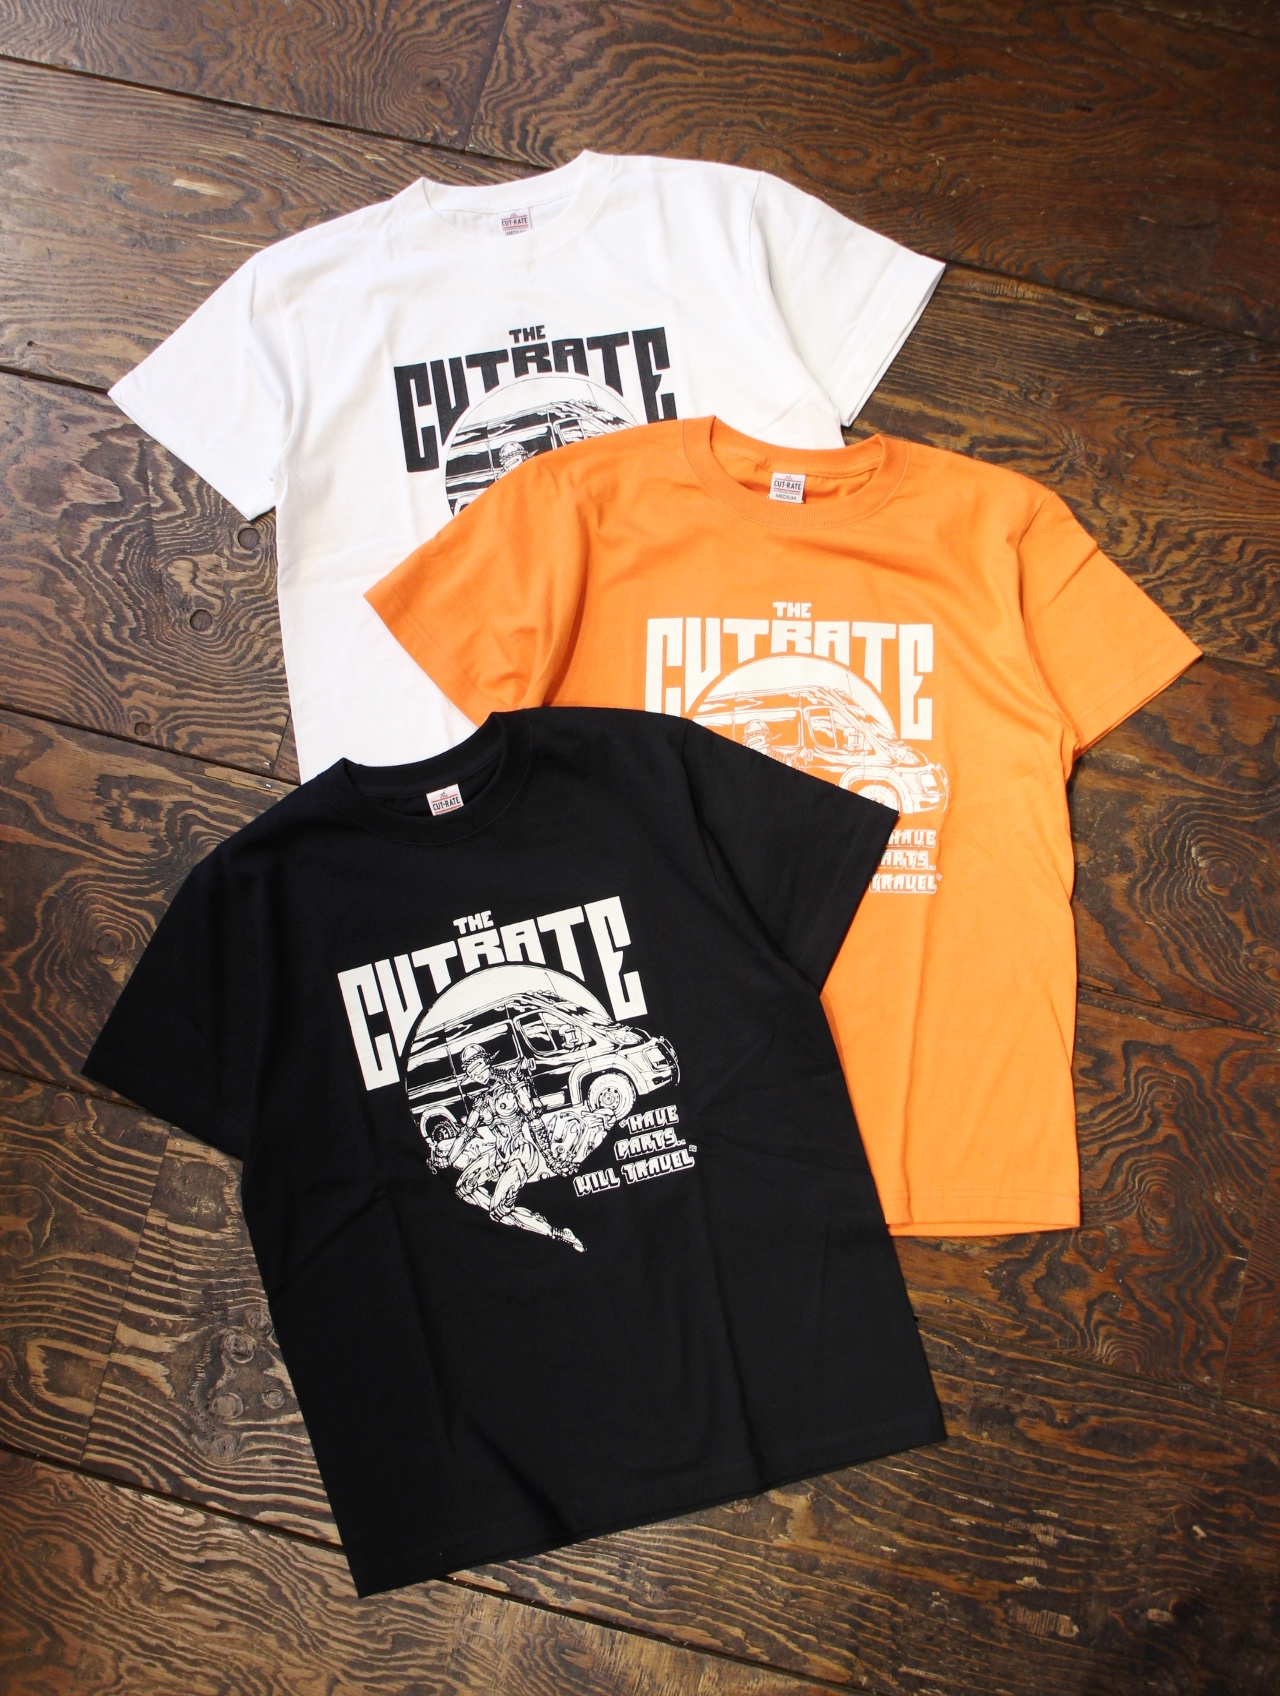 CUT RATE  「PROMASTER T-SHIRT」 プリントティーシャツ